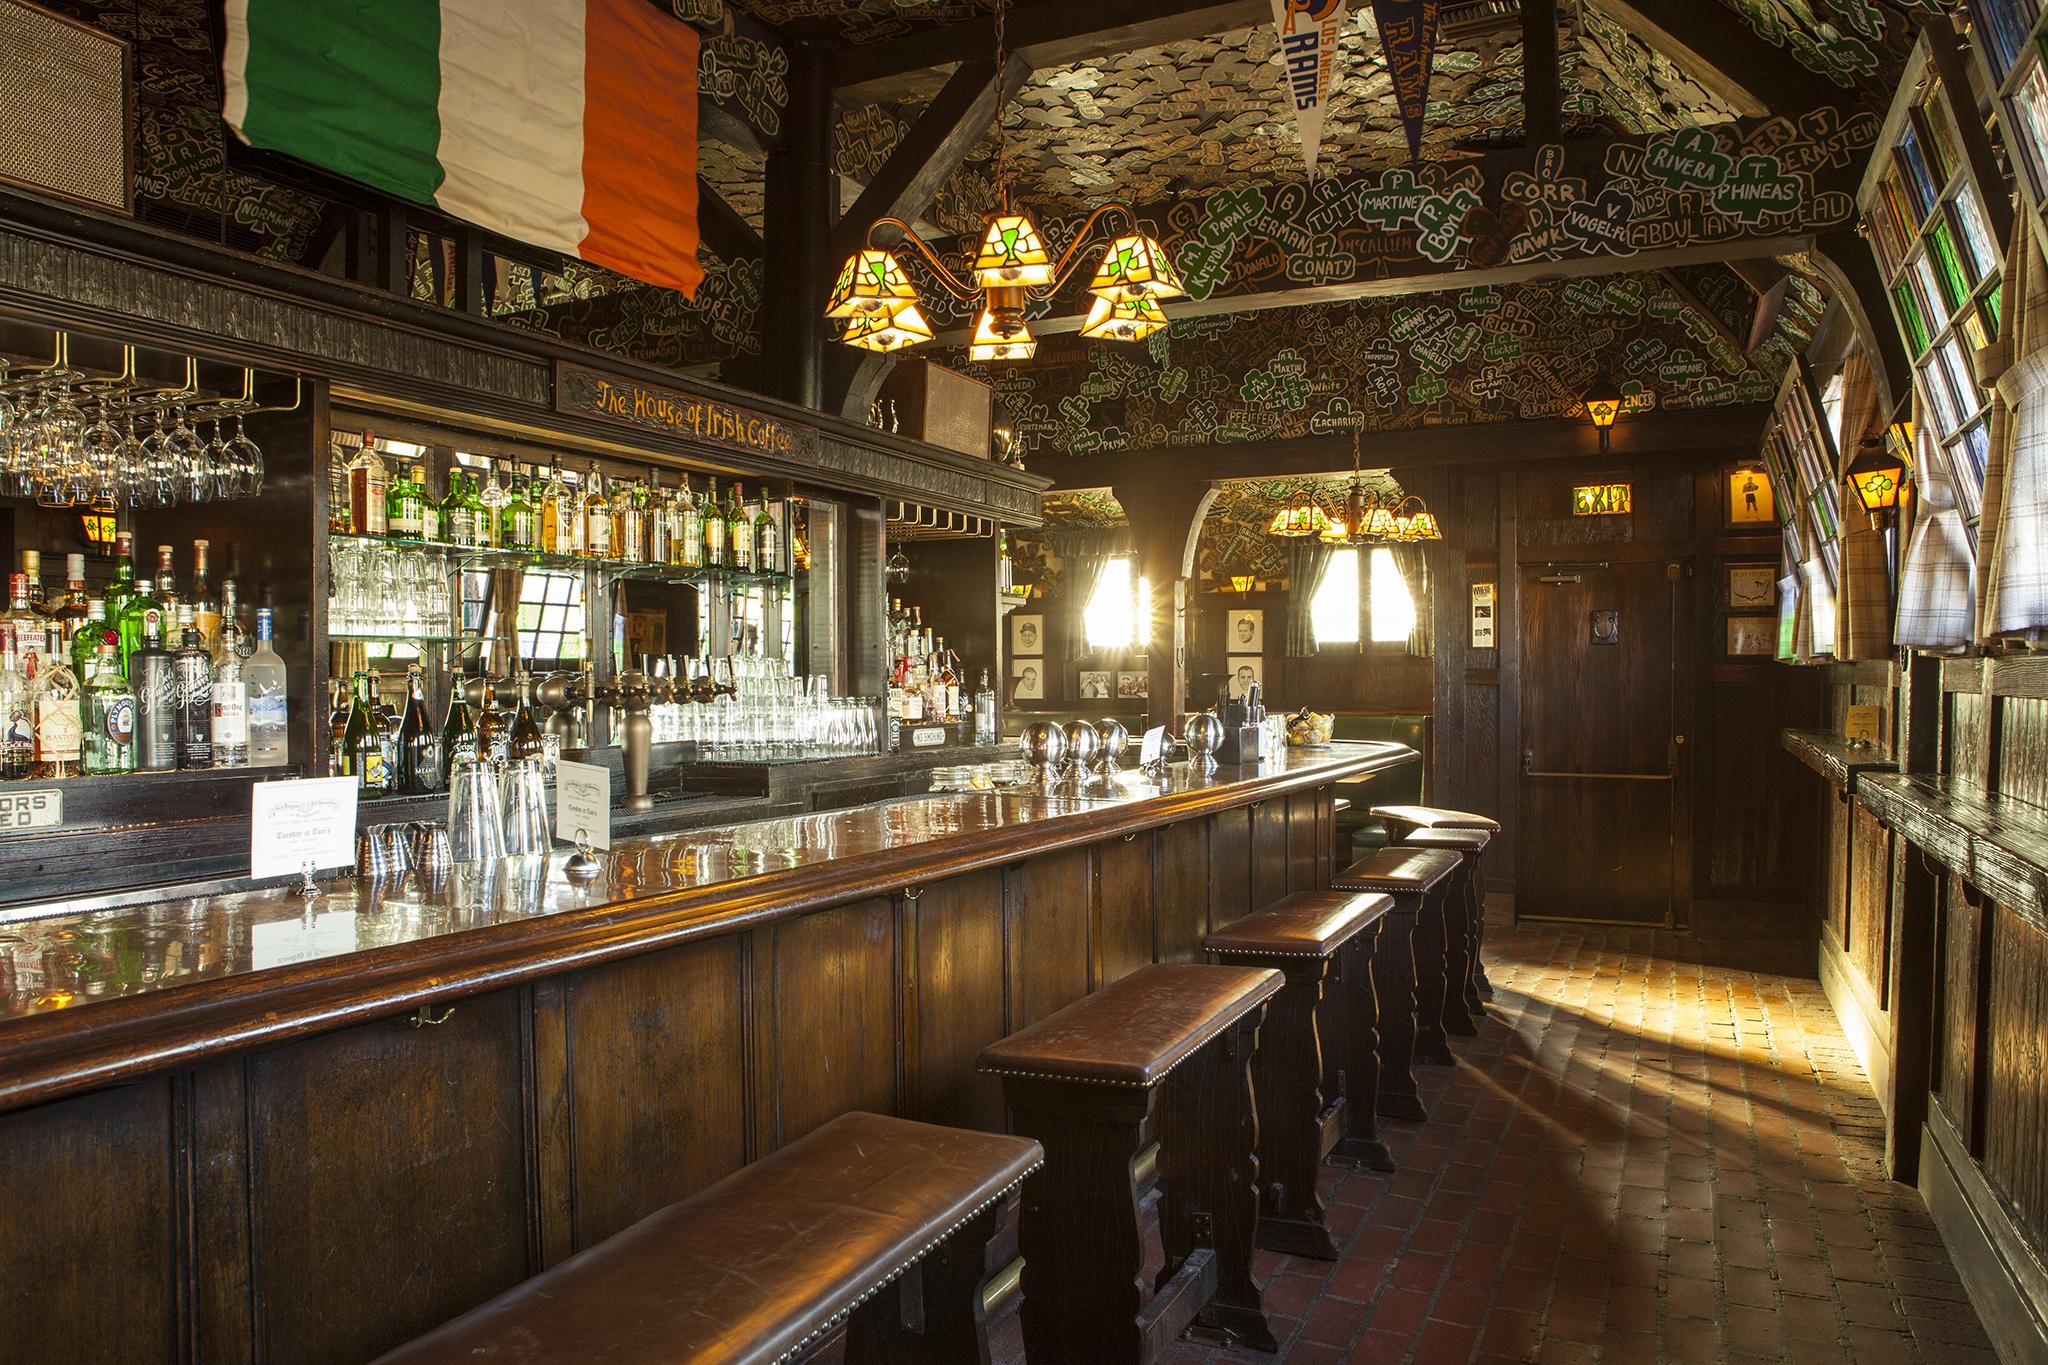 Raise a pint and an Irish coffee: Tom Bergin's Public House is closing